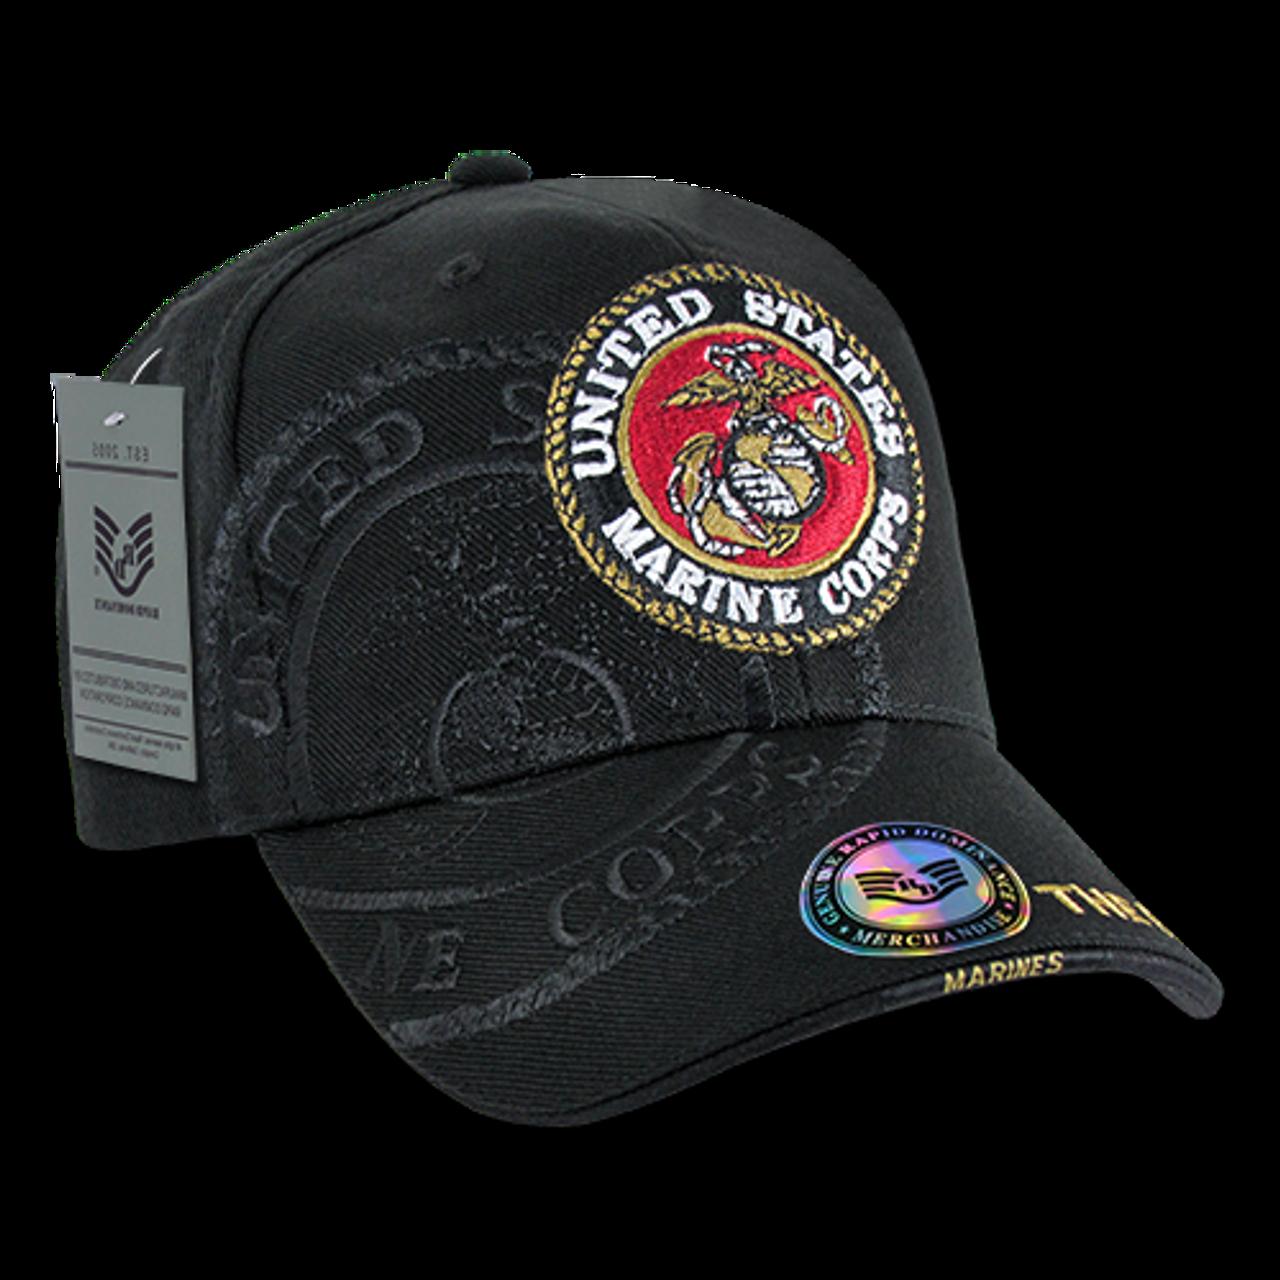 833199527c3542 ... S007 - U.S. Marines Logo Shadow Cap - Direct Embroidered - Black ...